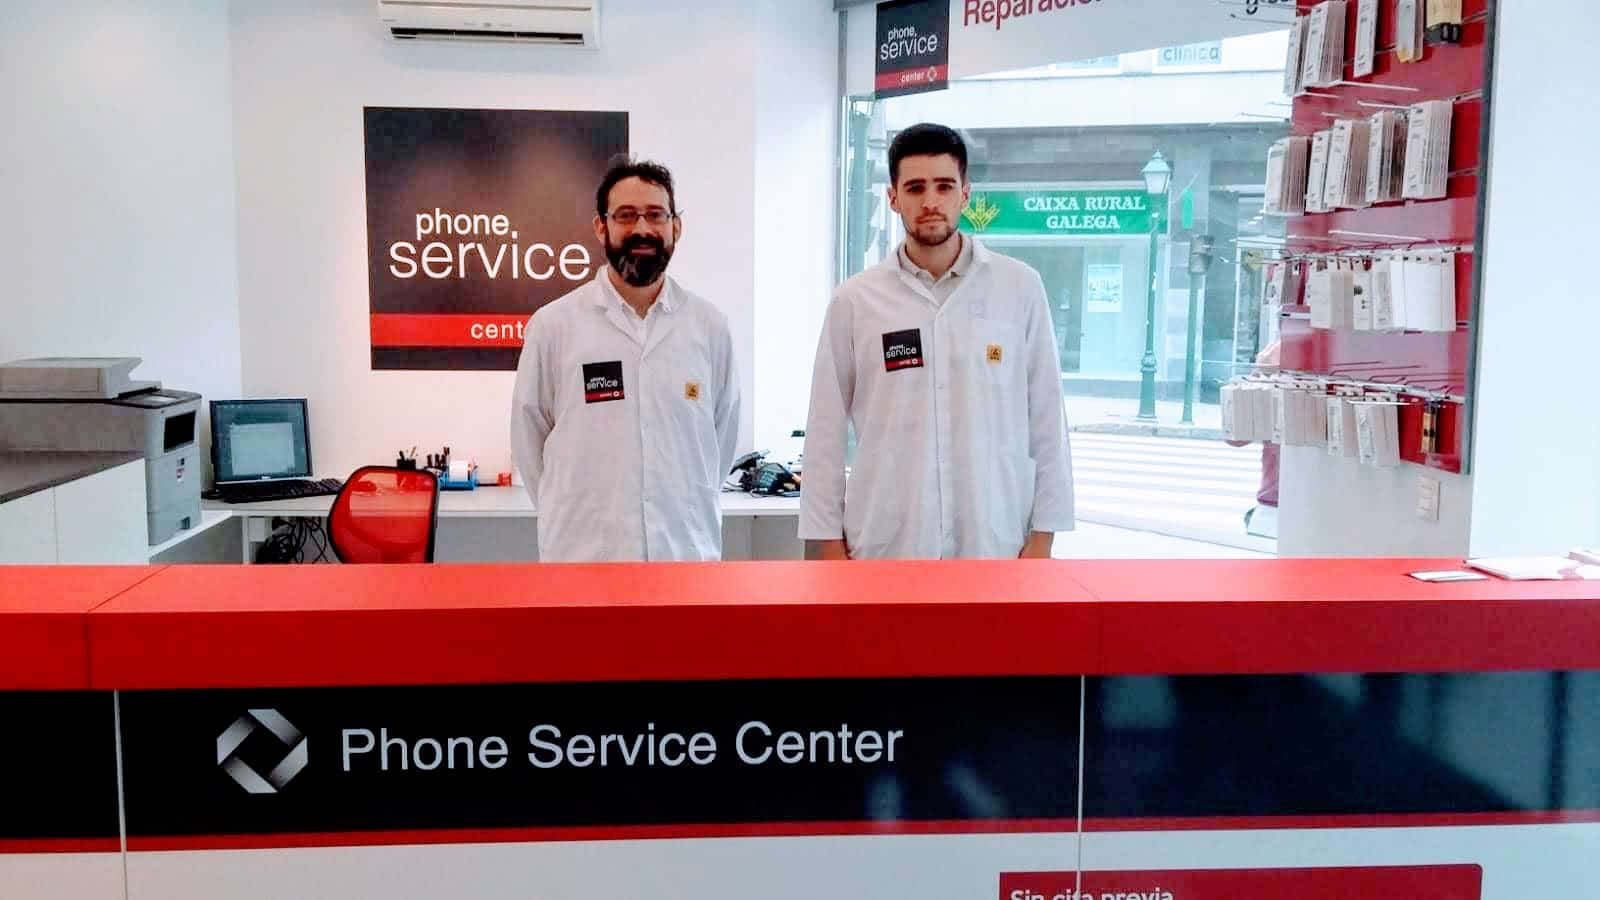 phone service center santiago de compostela